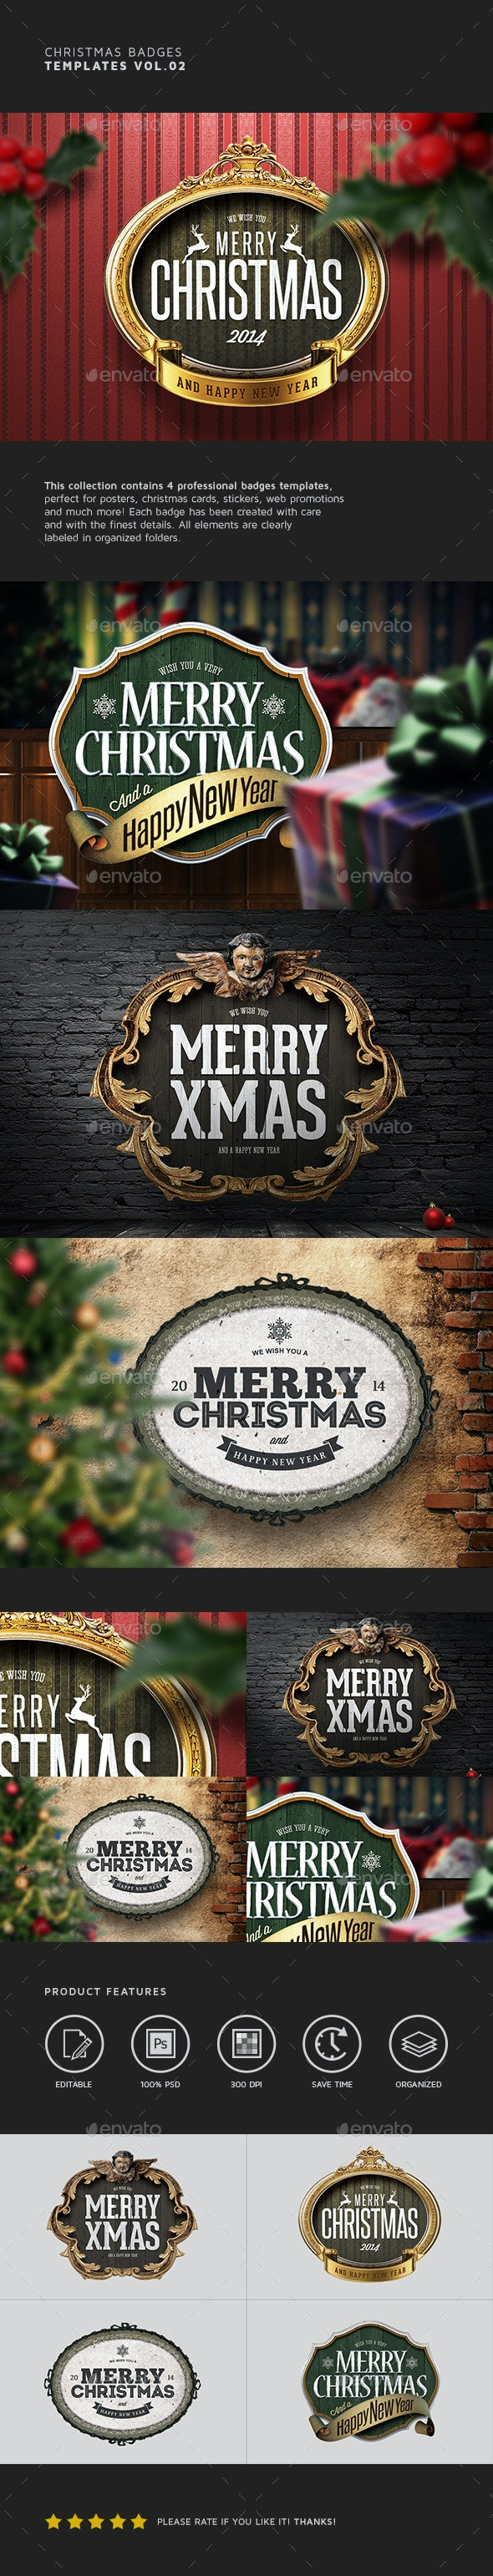 Christmas Badges Vol.02 - Badges & Stickers Web Elements